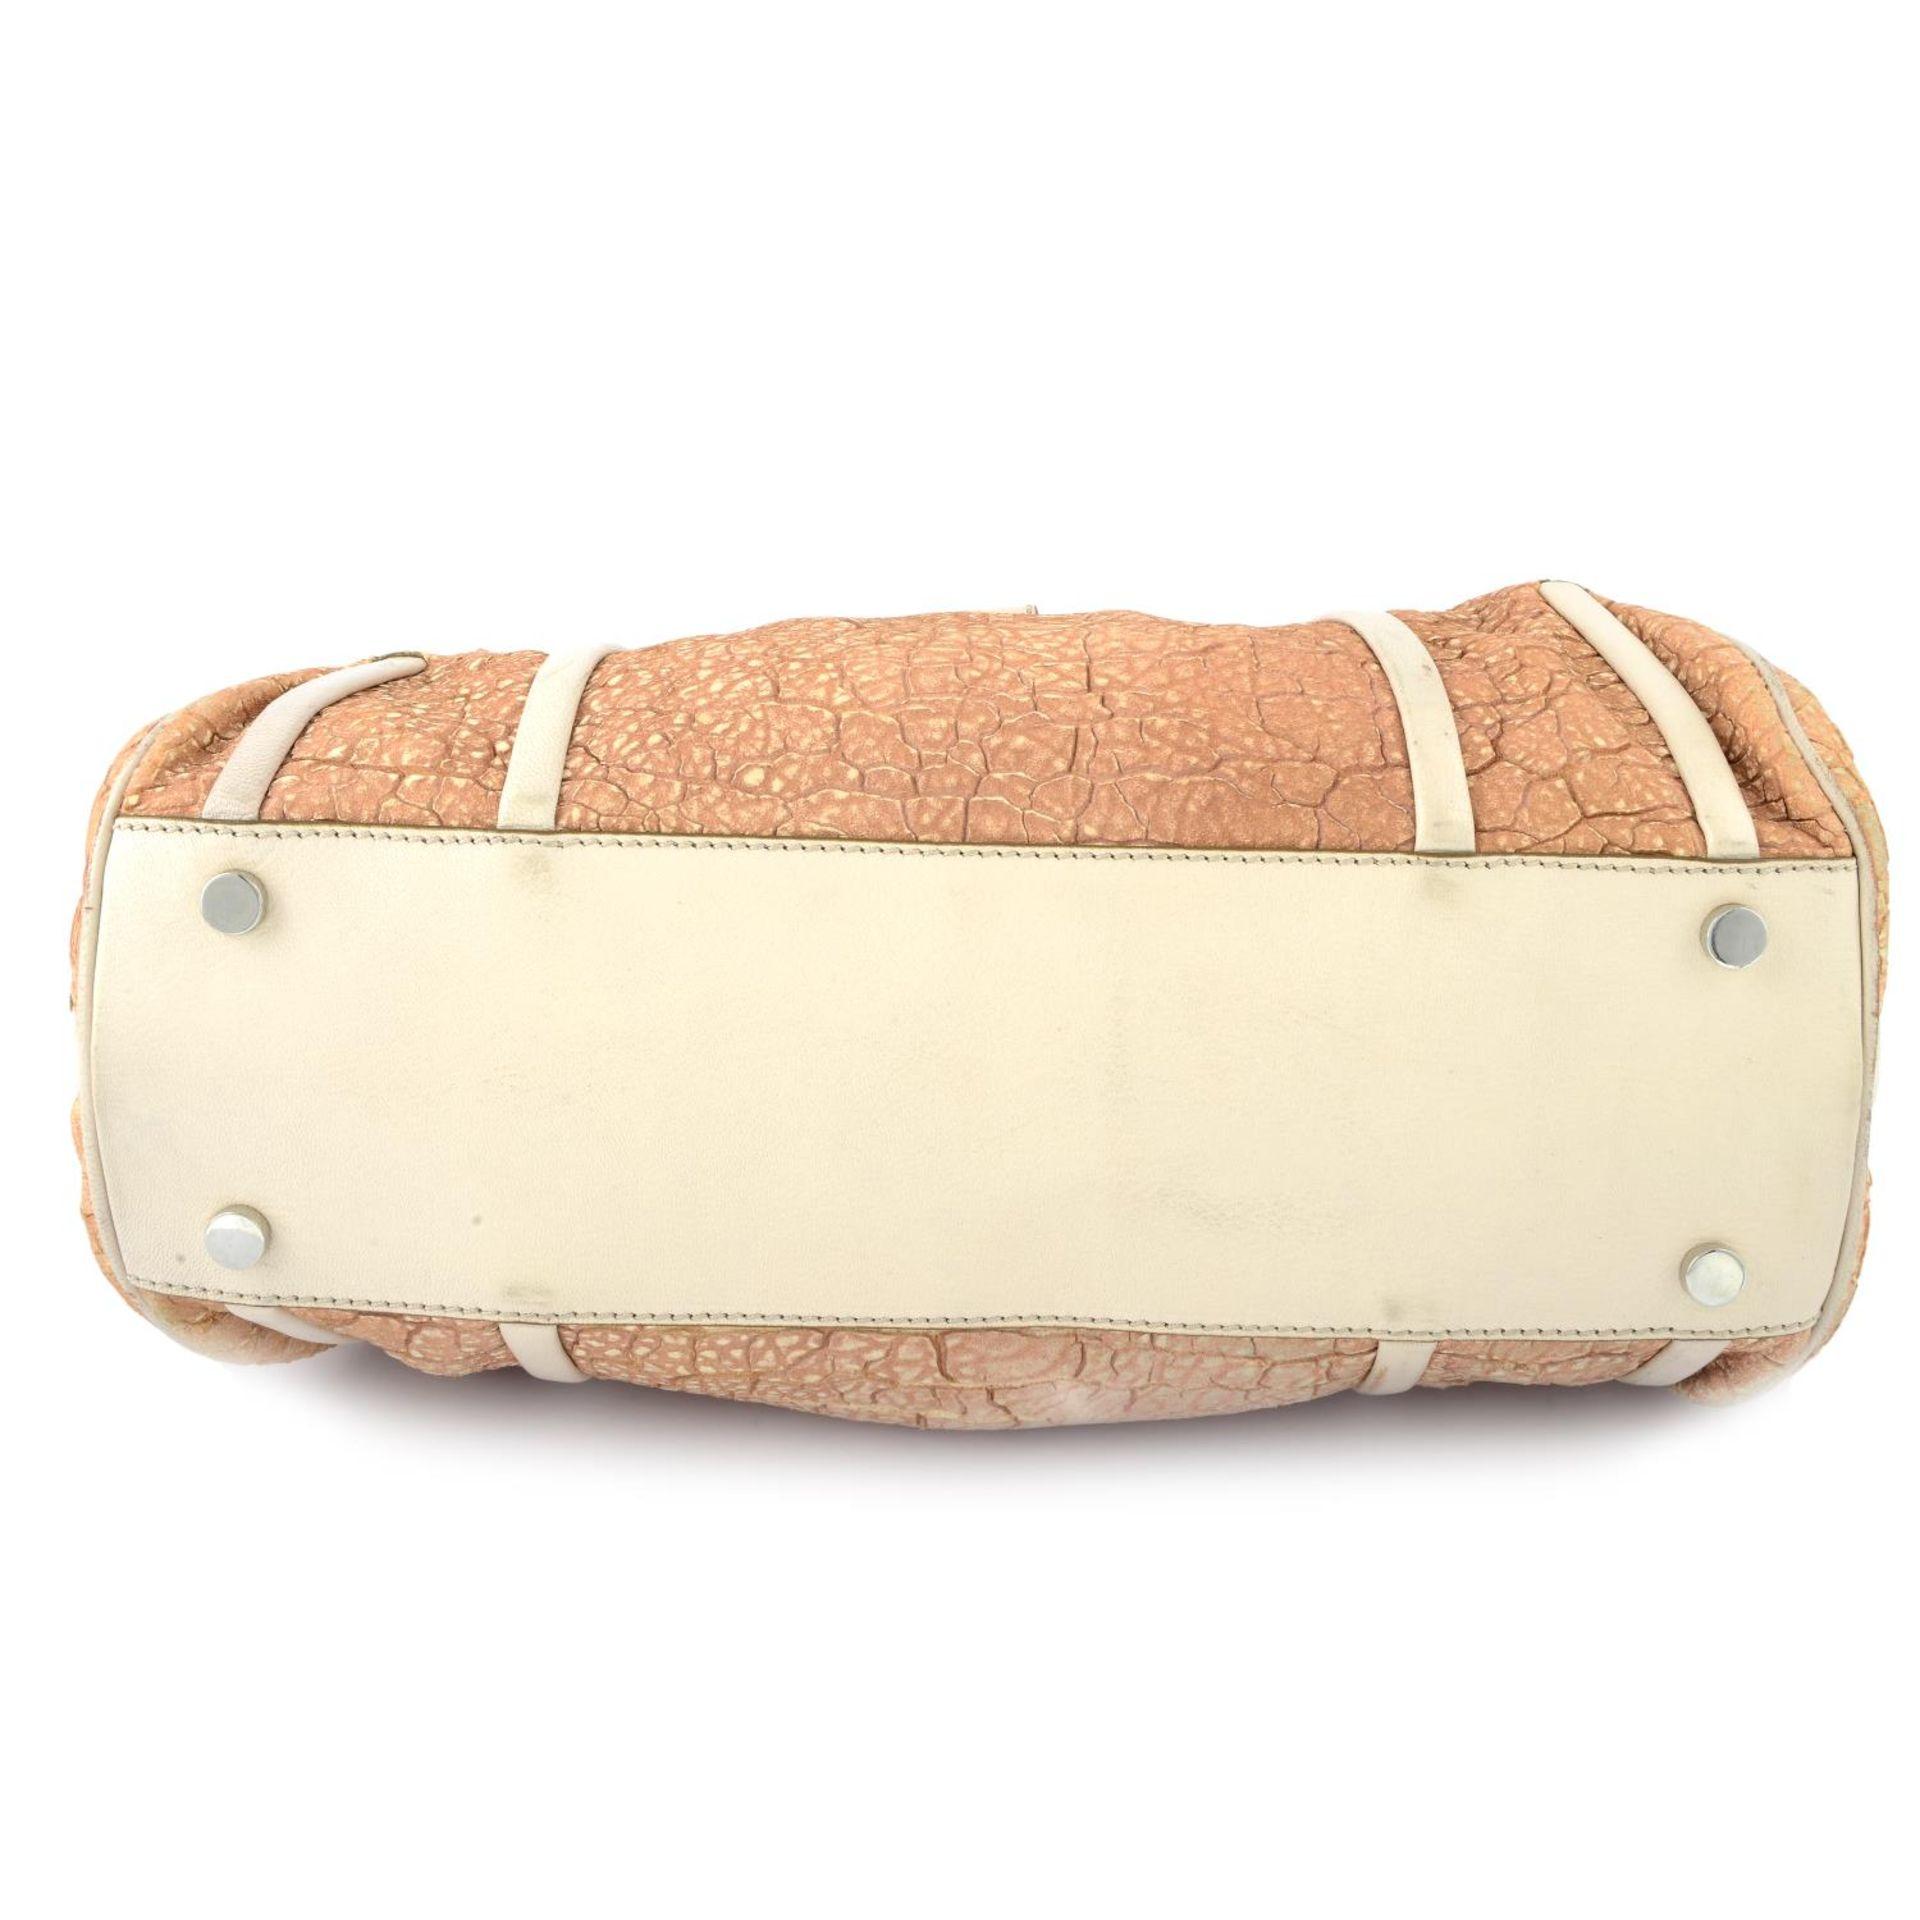 CÉLINE - a nude textured leather handbag. - Image 3 of 4